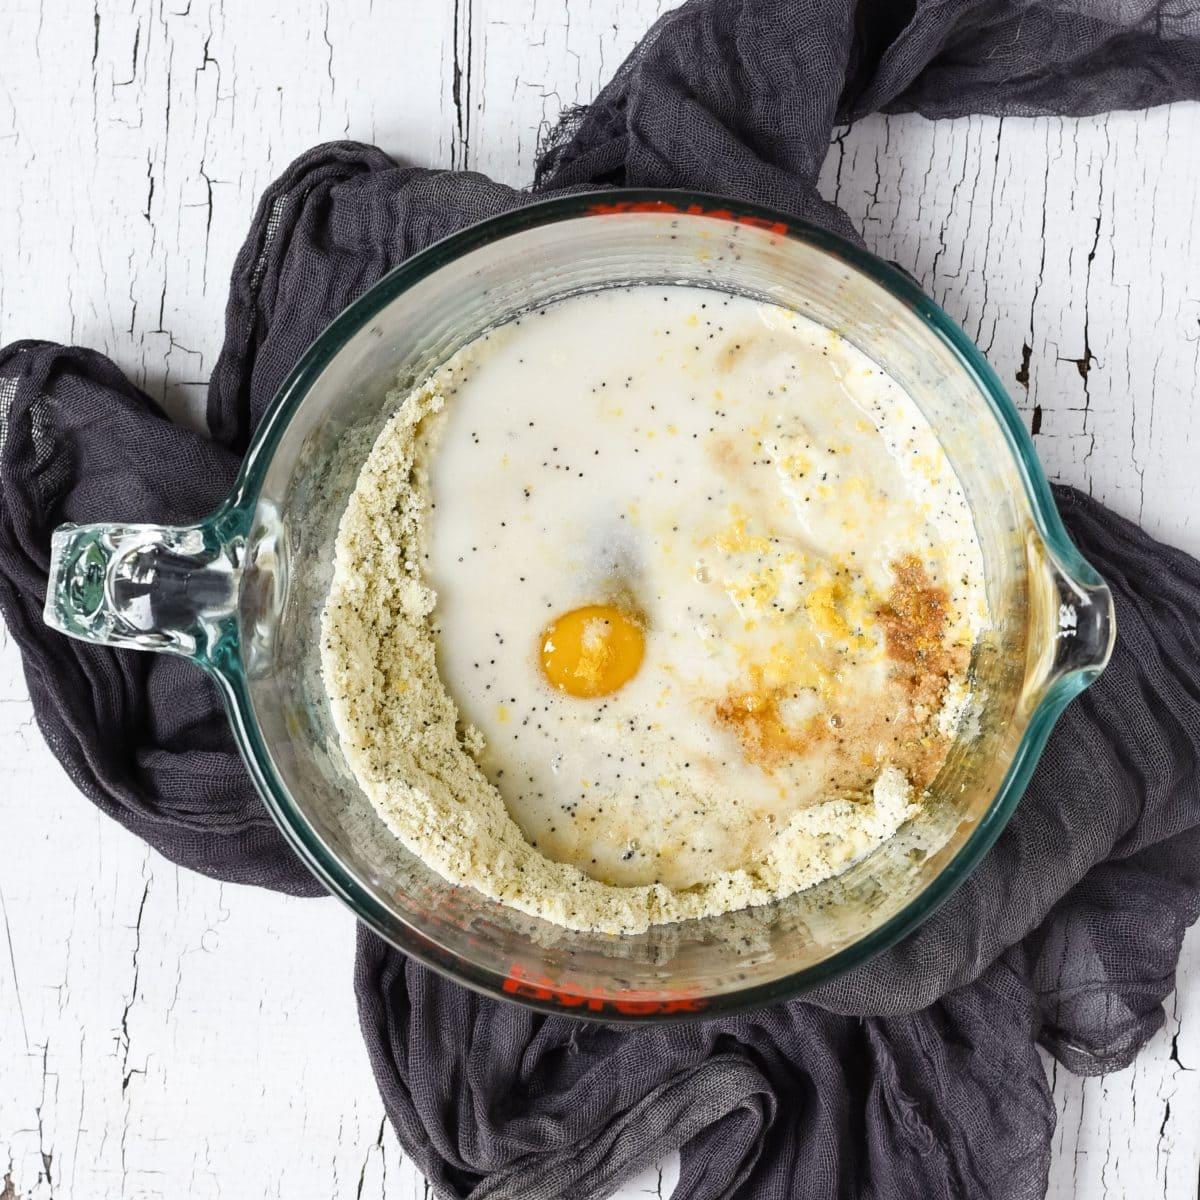 Poppy seed pancake batter - unmixed